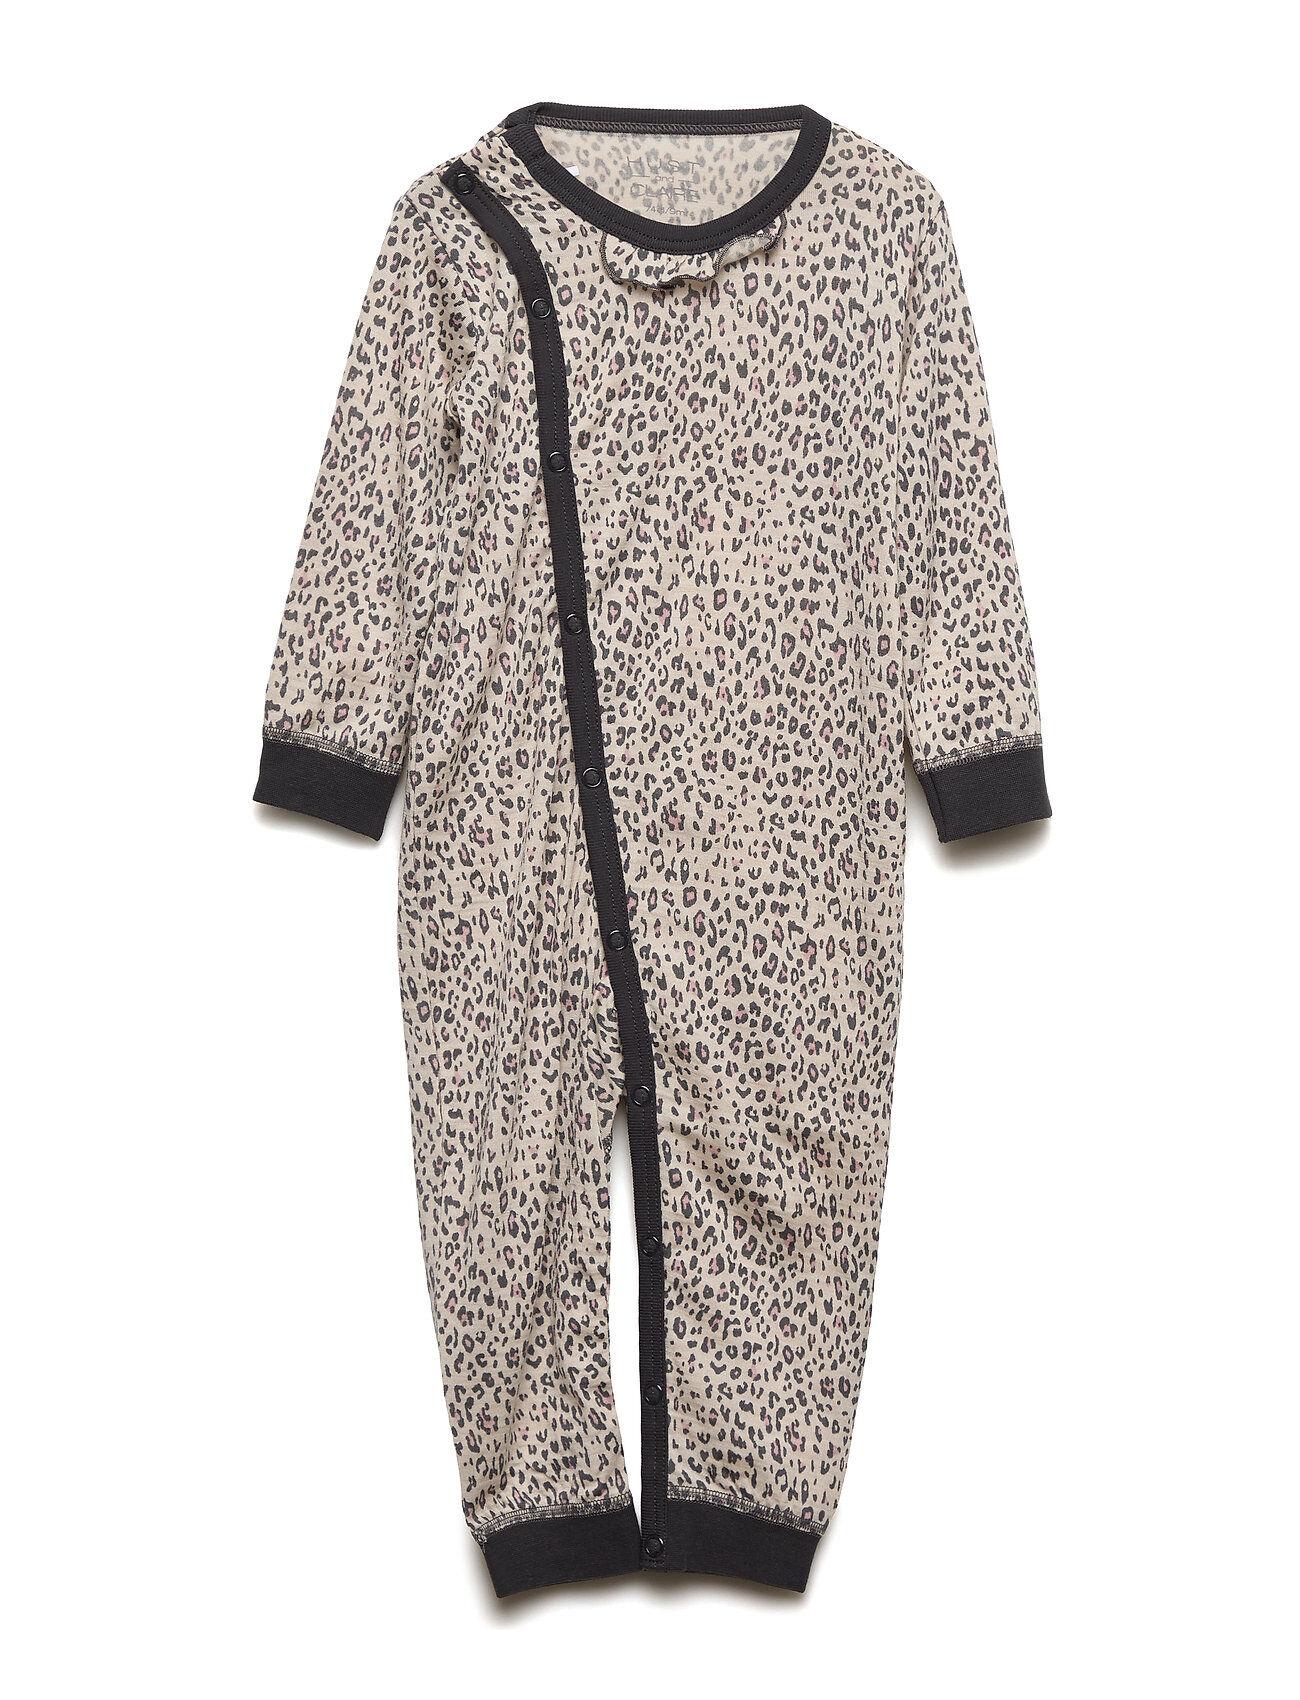 Hust & Claire Mija - Nightwear Pyjama Sie Jumpsuit Haalari Harmaa Hust & Claire